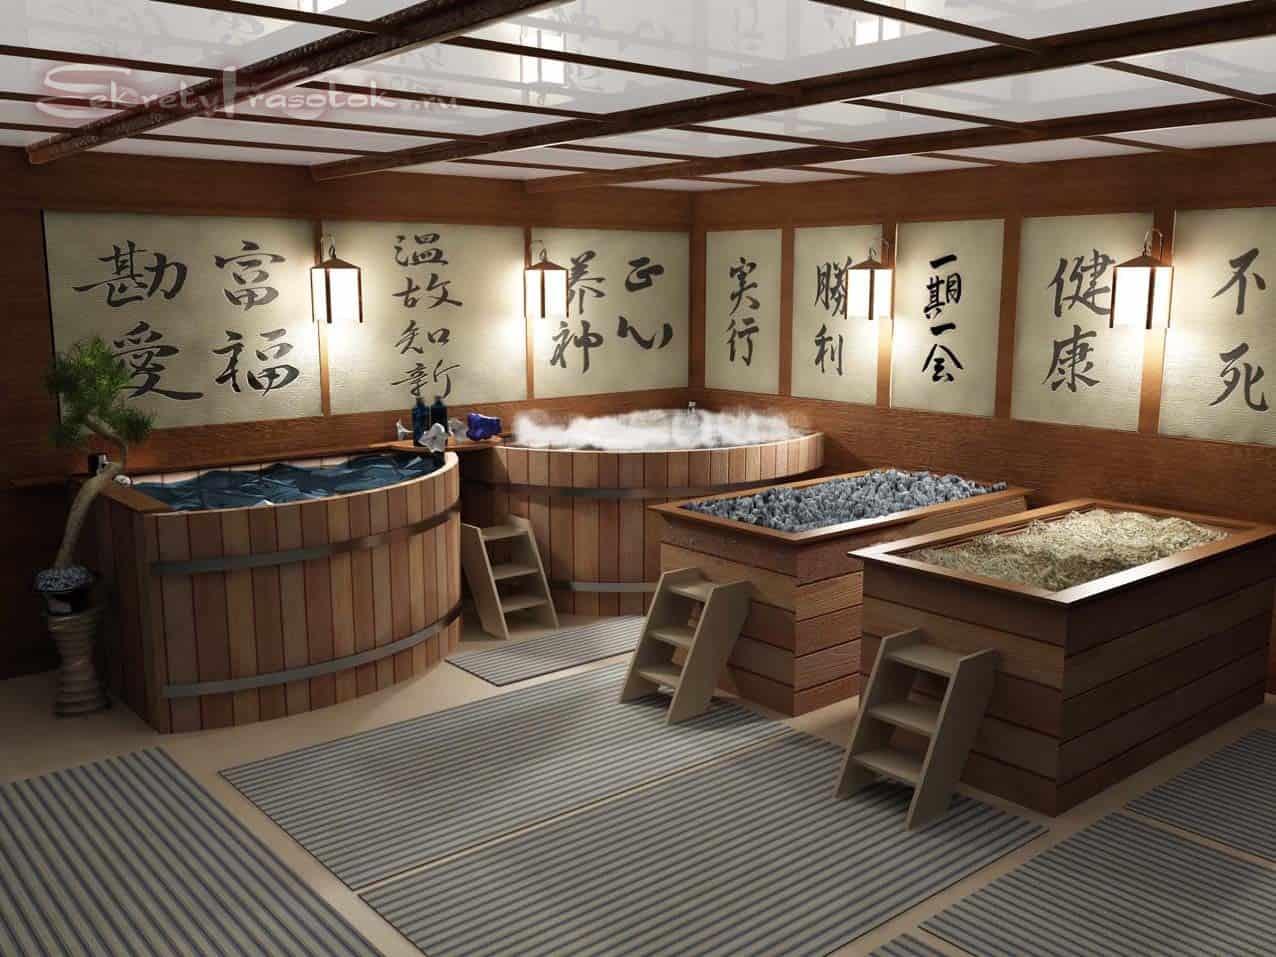 японская баня - офуро